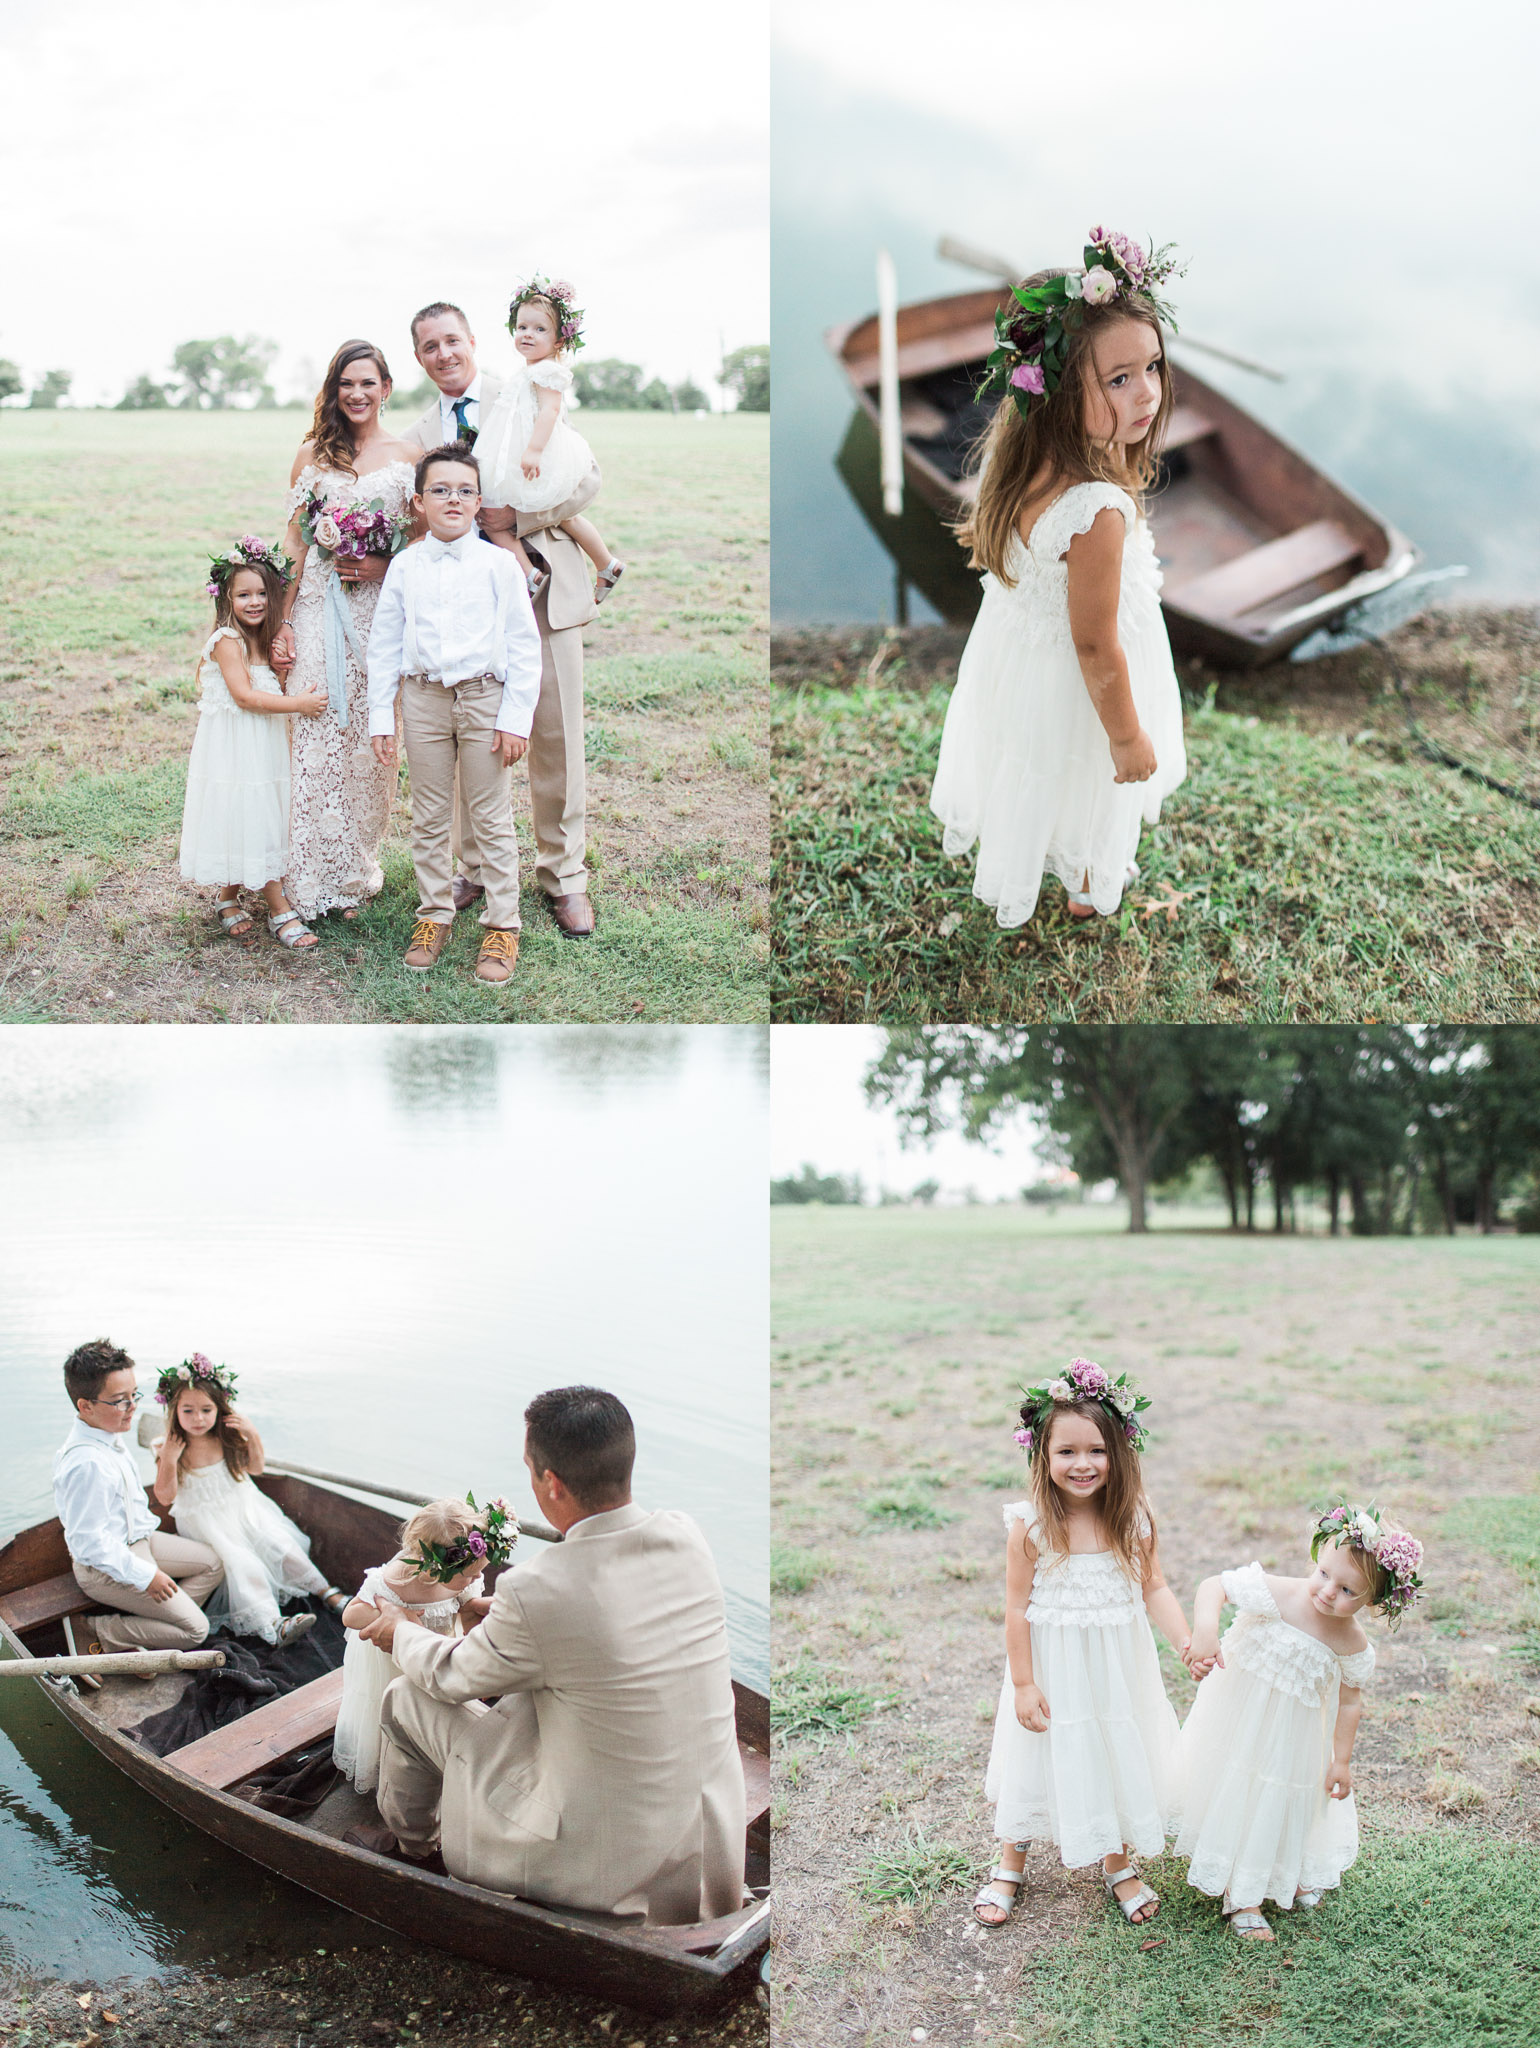 TheBigFakeWedding_DFW_wedding_photographer-109.jpg